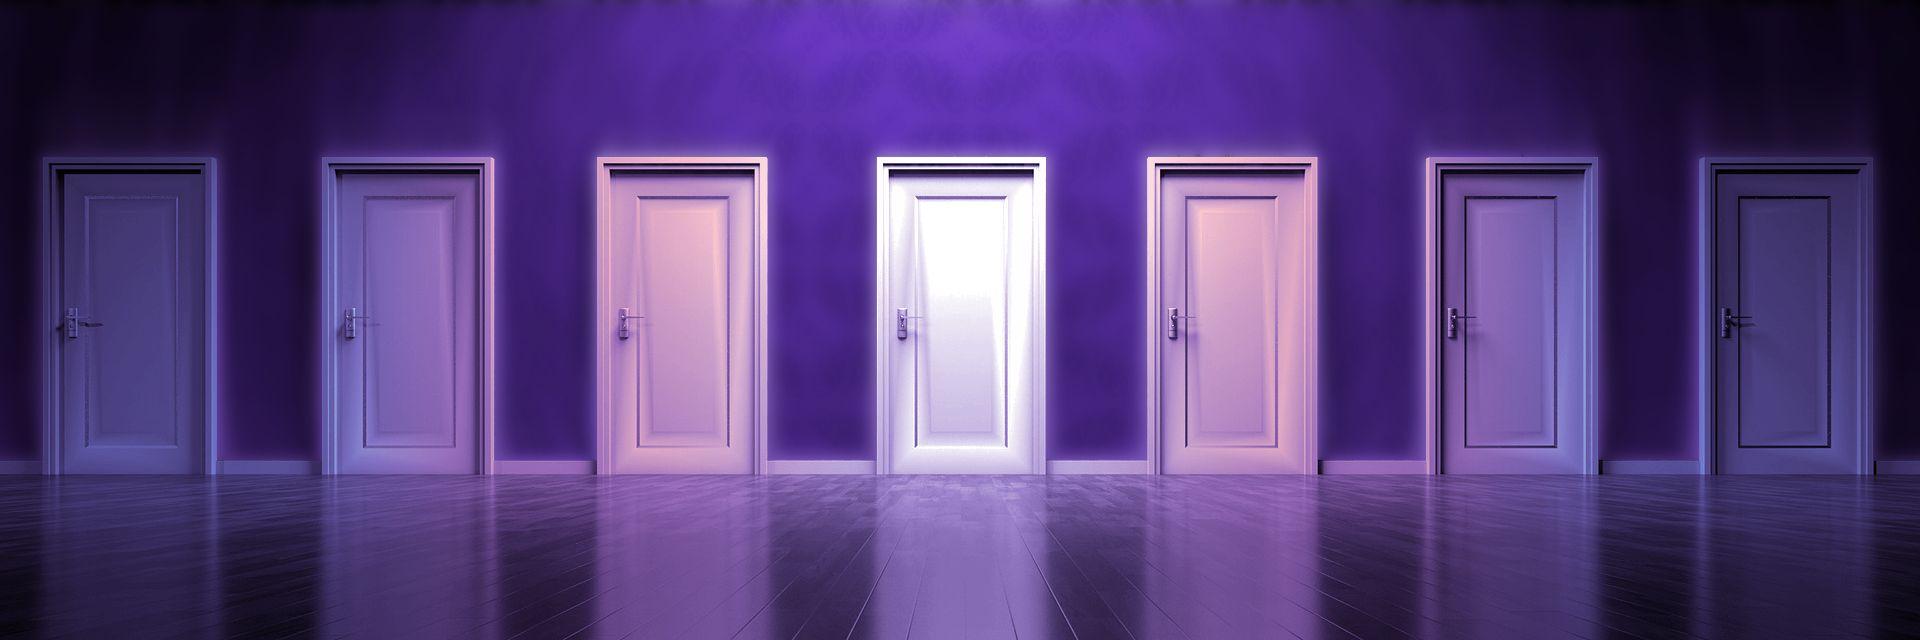 sen - labirynt drzwi